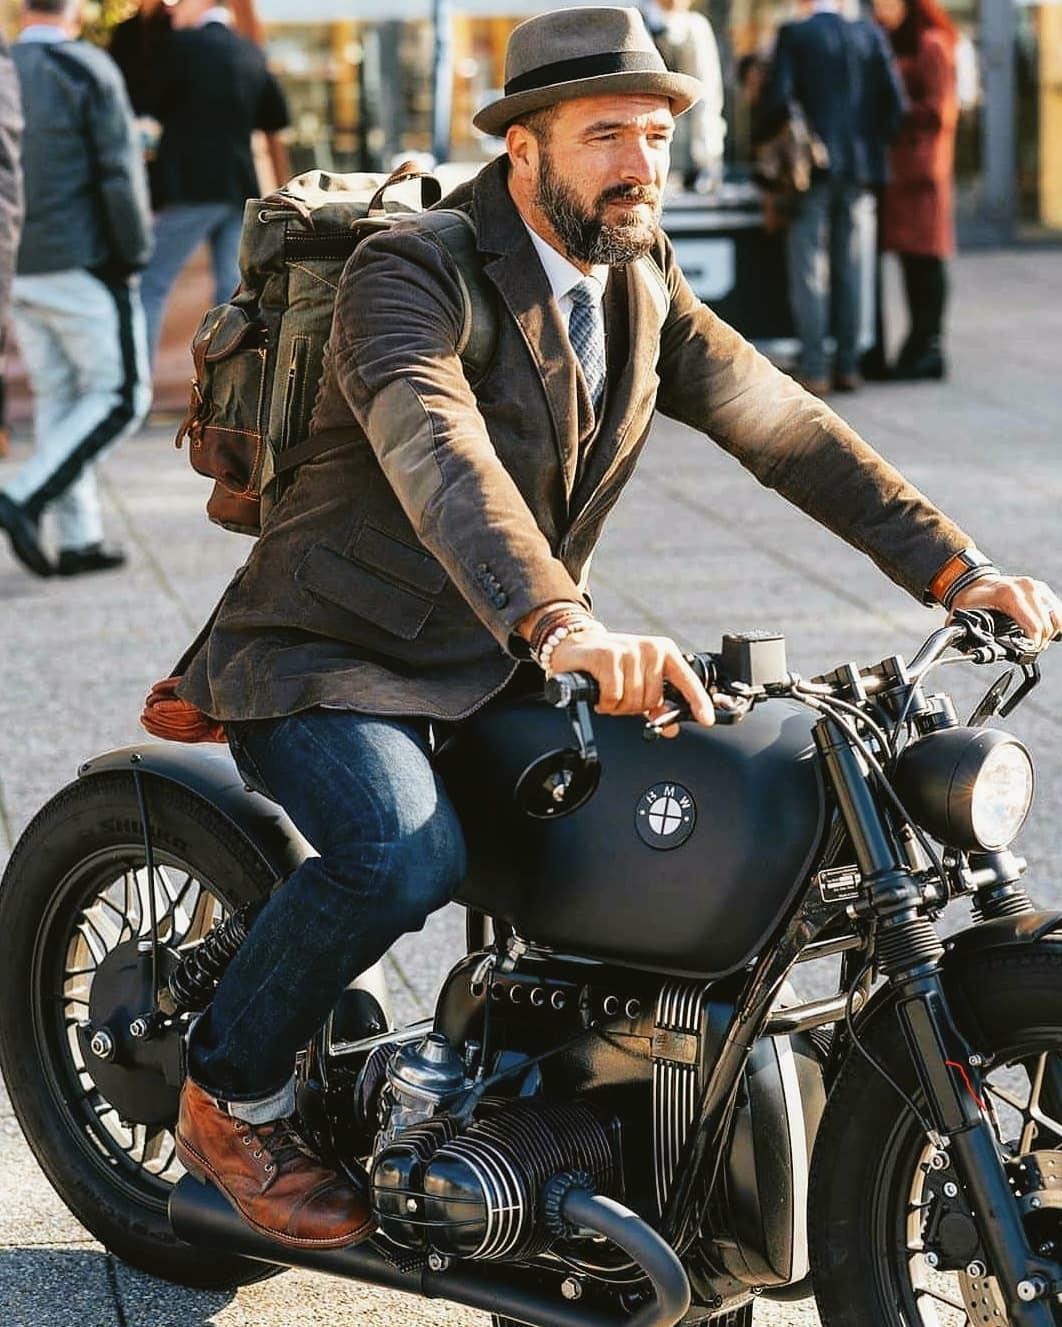 dapper gentleman on bmw motorcycle